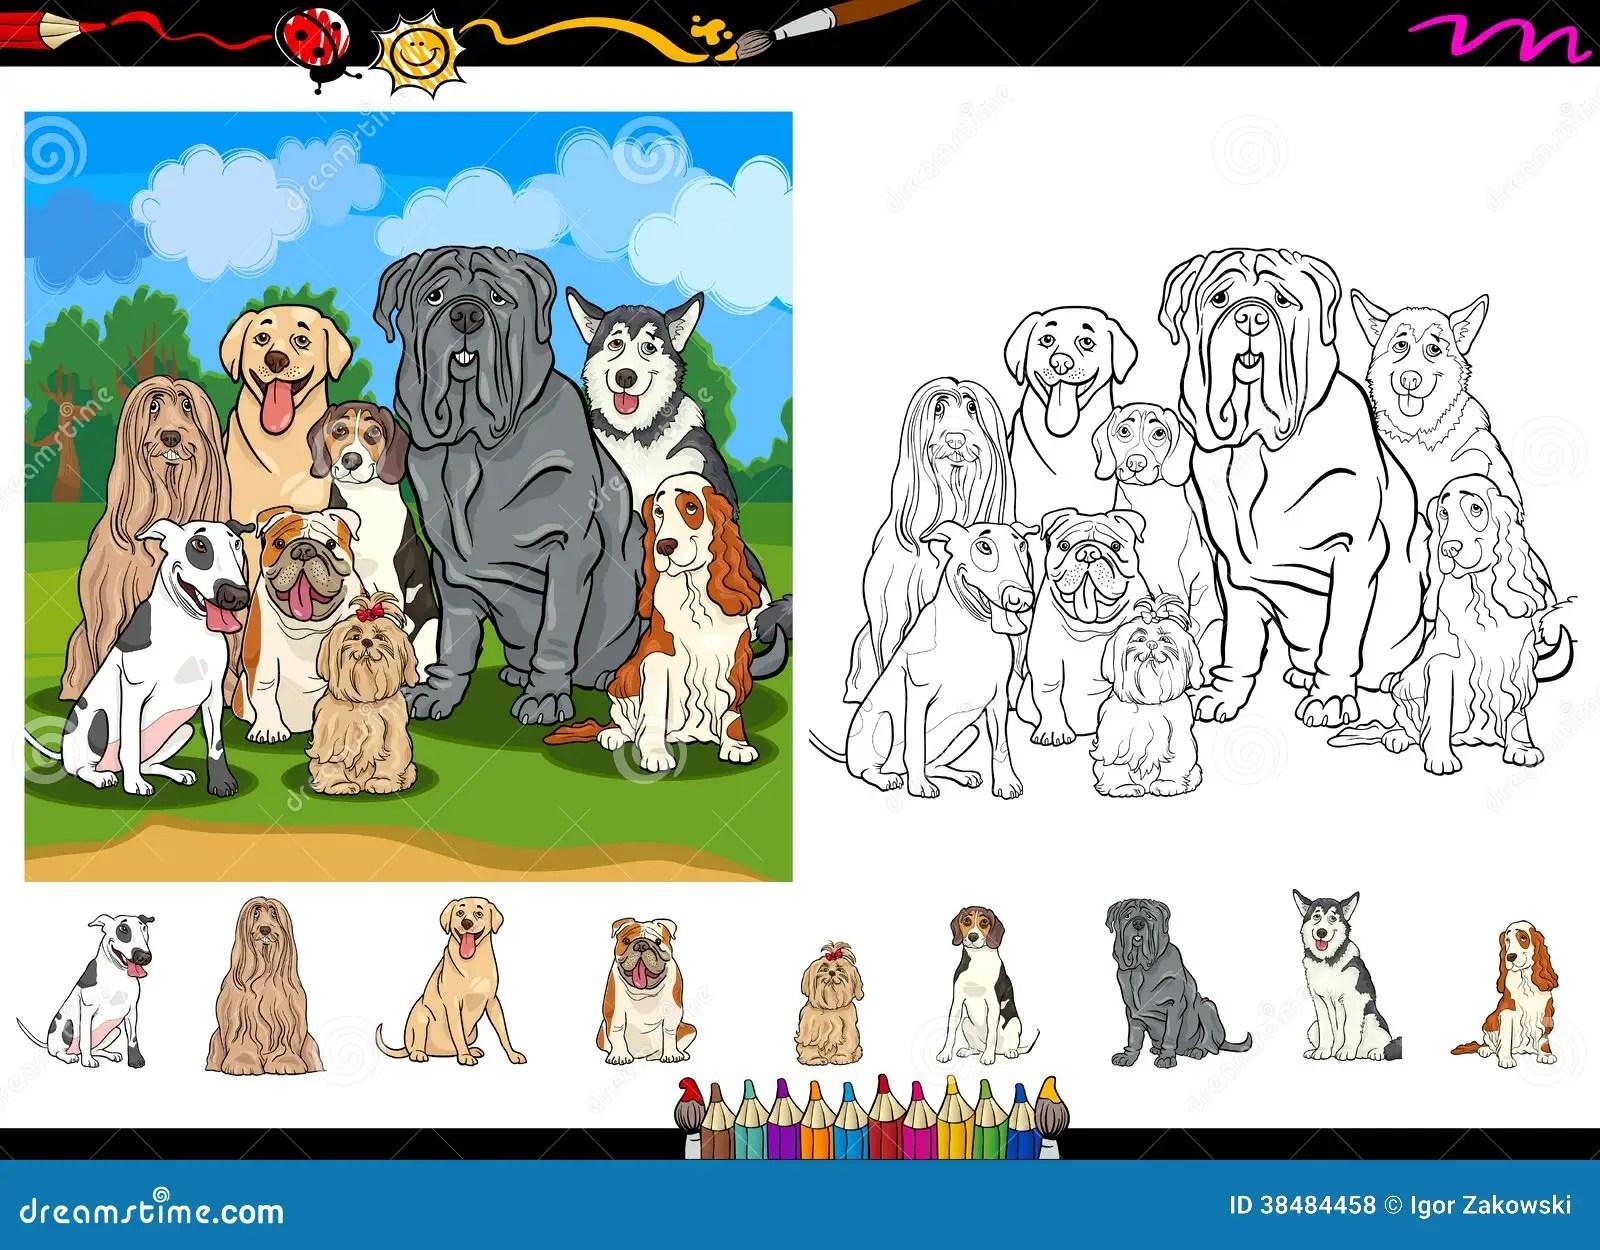 dog breeds cartoon coloring page set royalty free stock photos